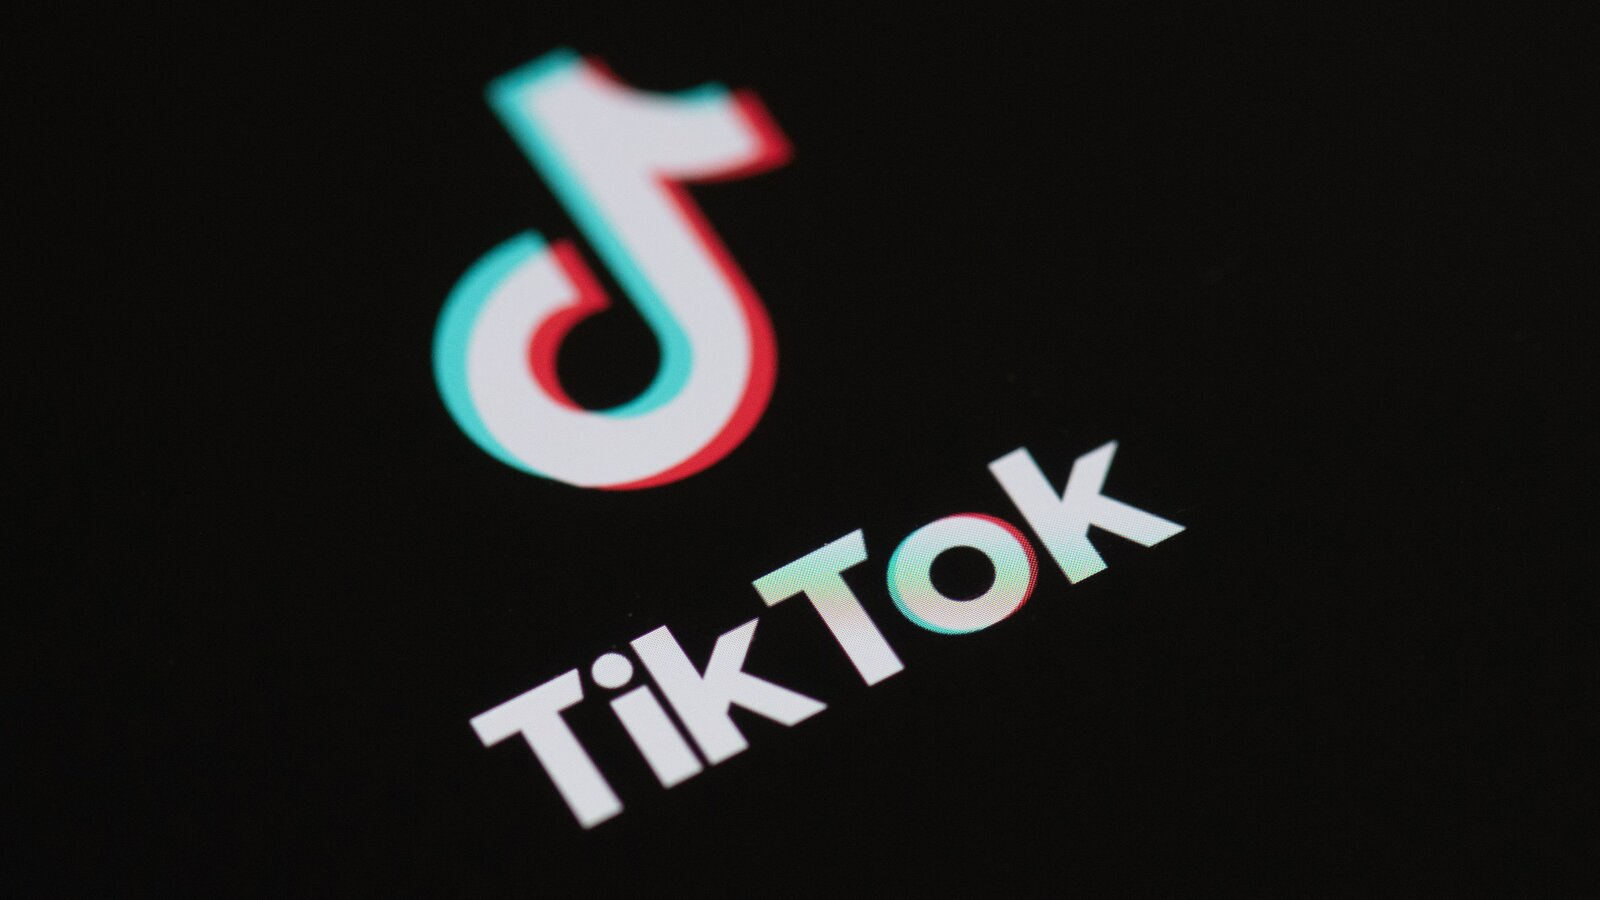 TikTok: Αναβαθμίζεται για τα τηλέφωνα iPhone 12 Pro και Pro Max